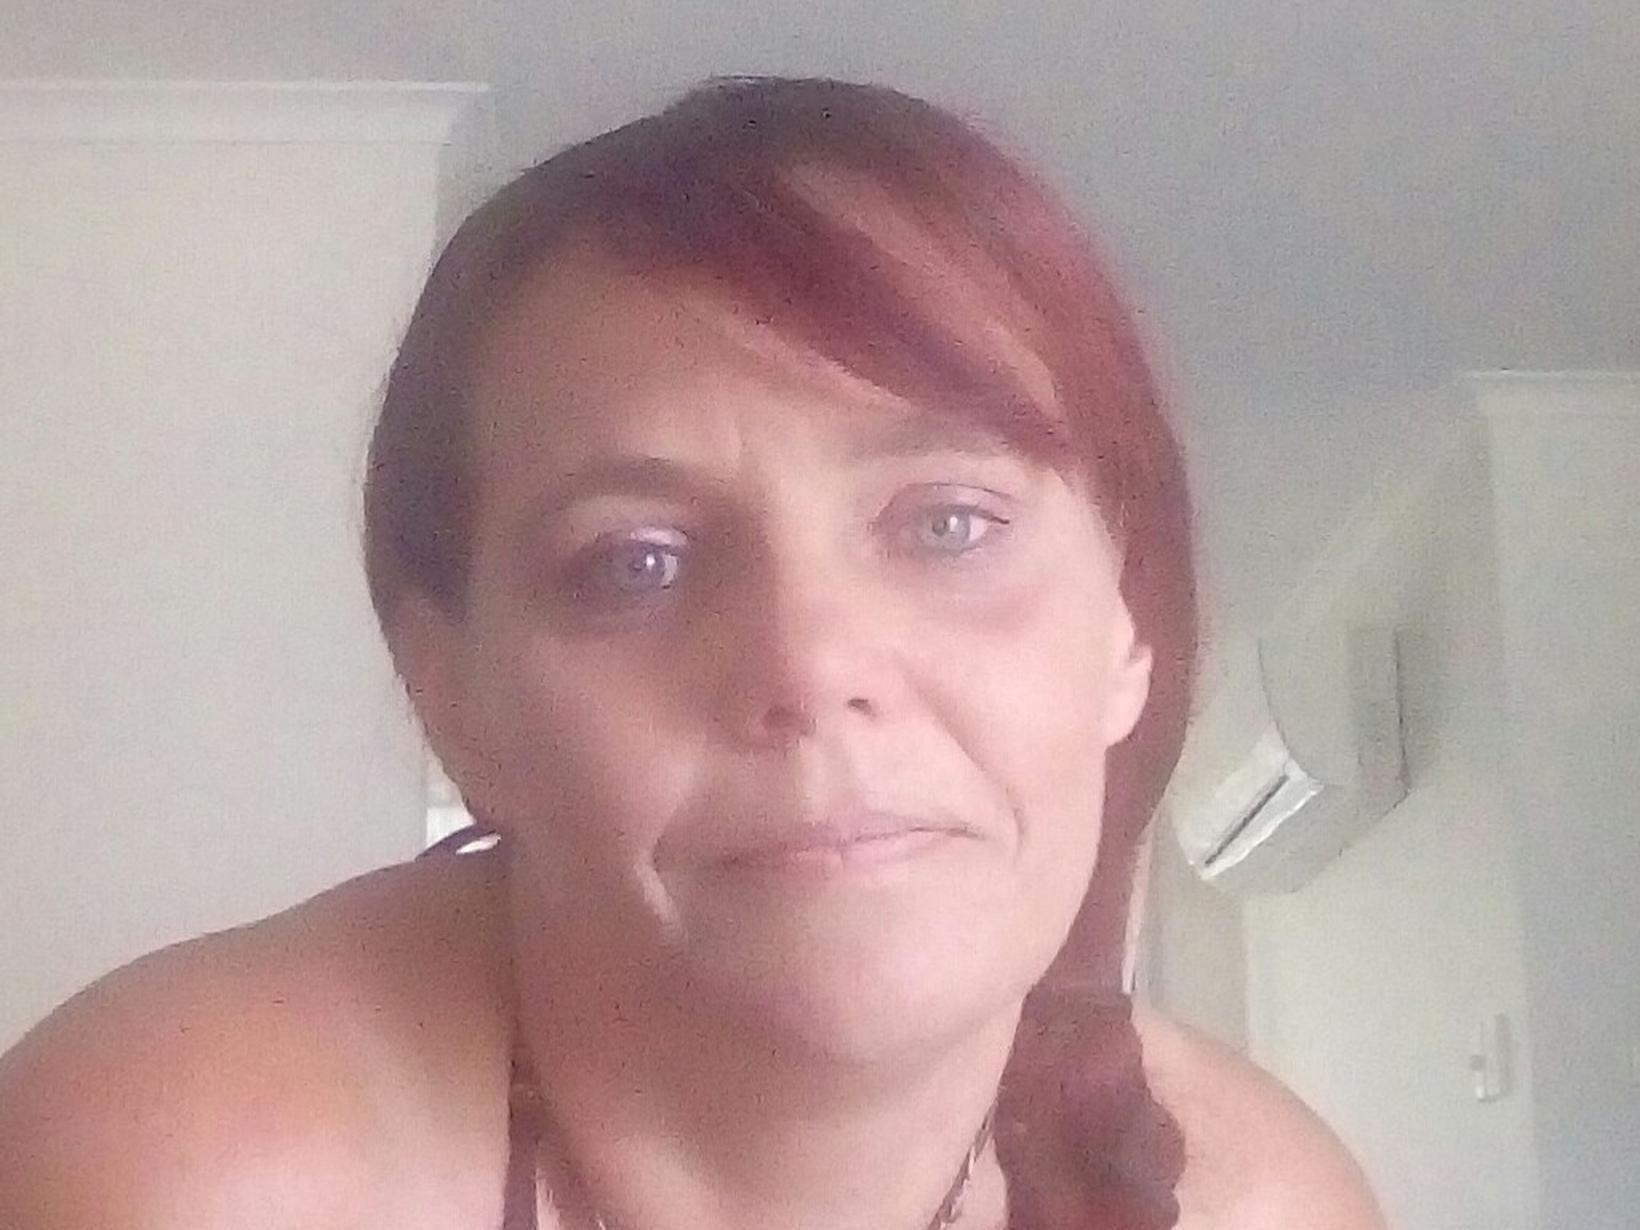 Natalie from Caboolture, Queensland, Australia